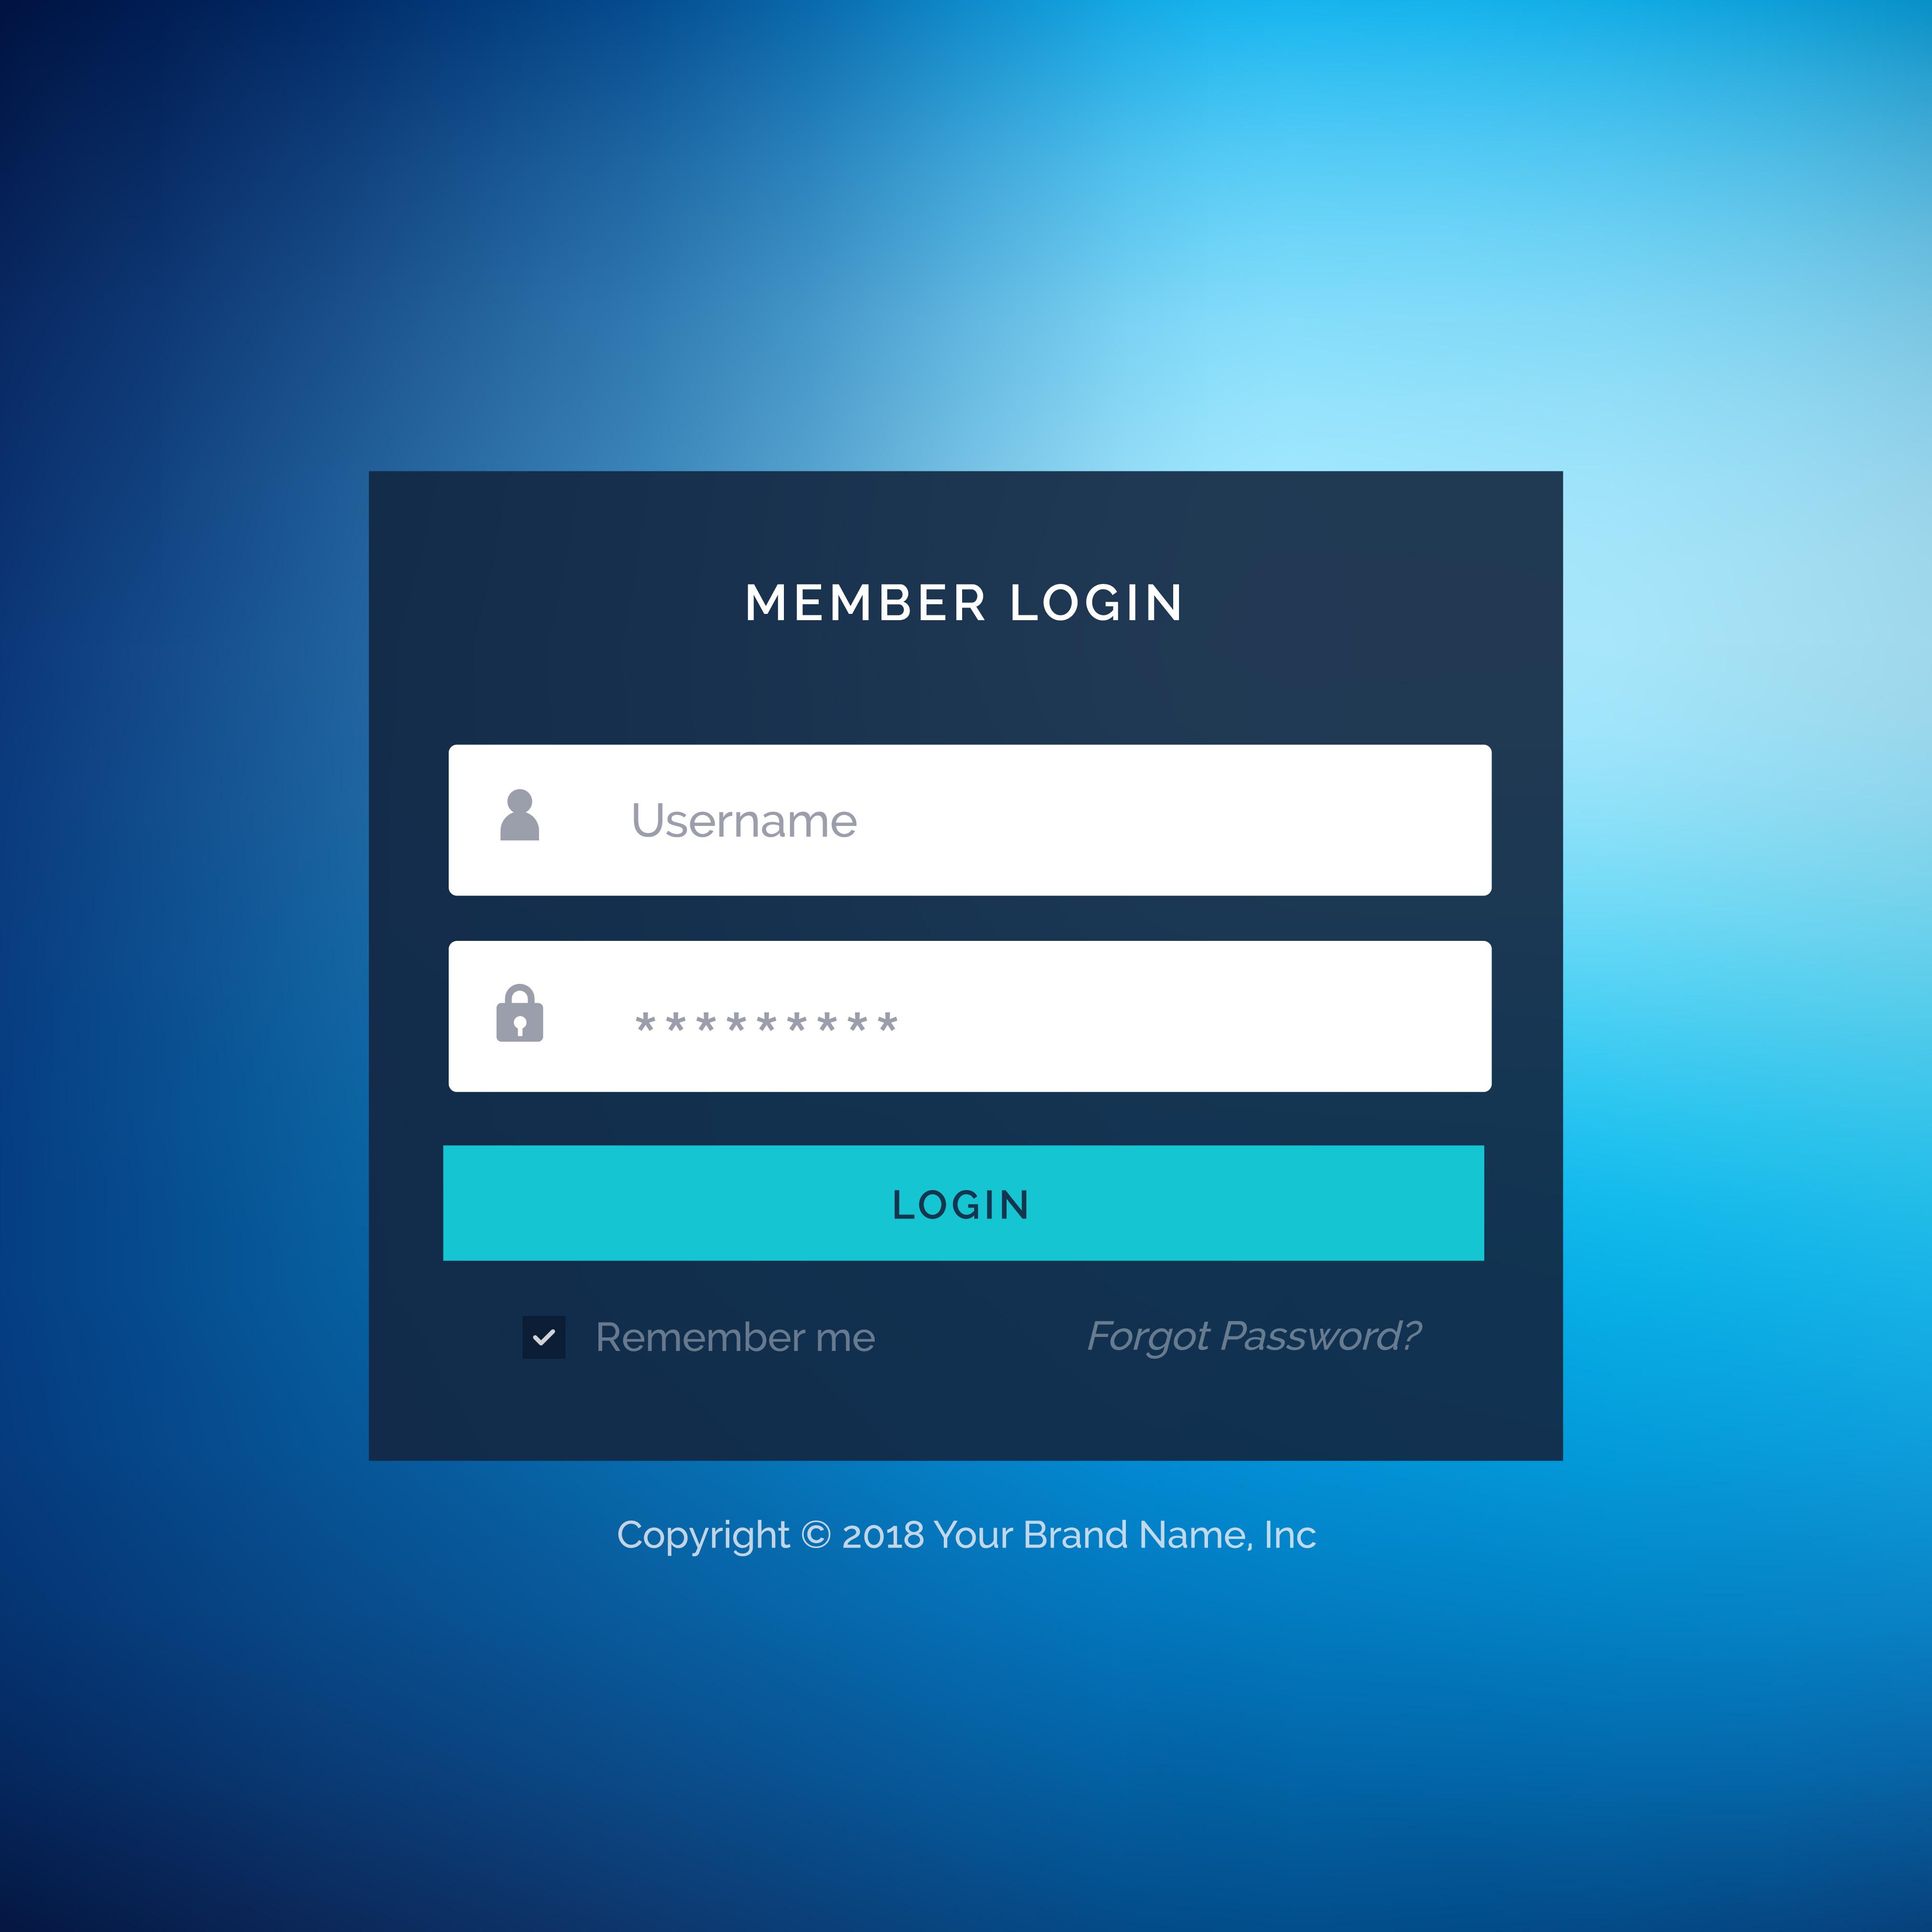 Blue Flat Ui Template Design In Vector Download Free Vector Art